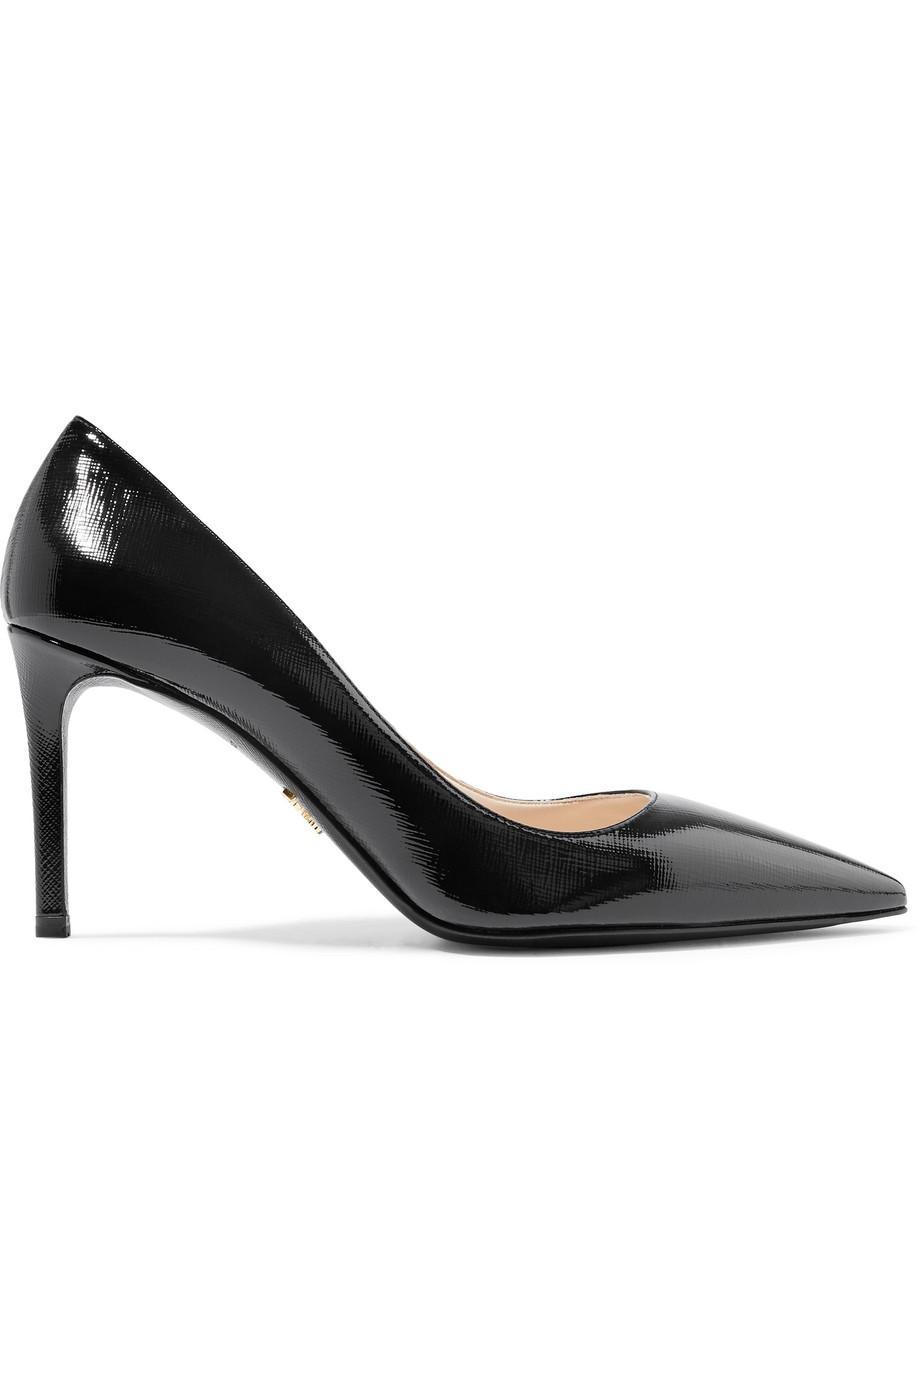 Glossed Textured-leather Pumps - Black Prada 4mYeZ